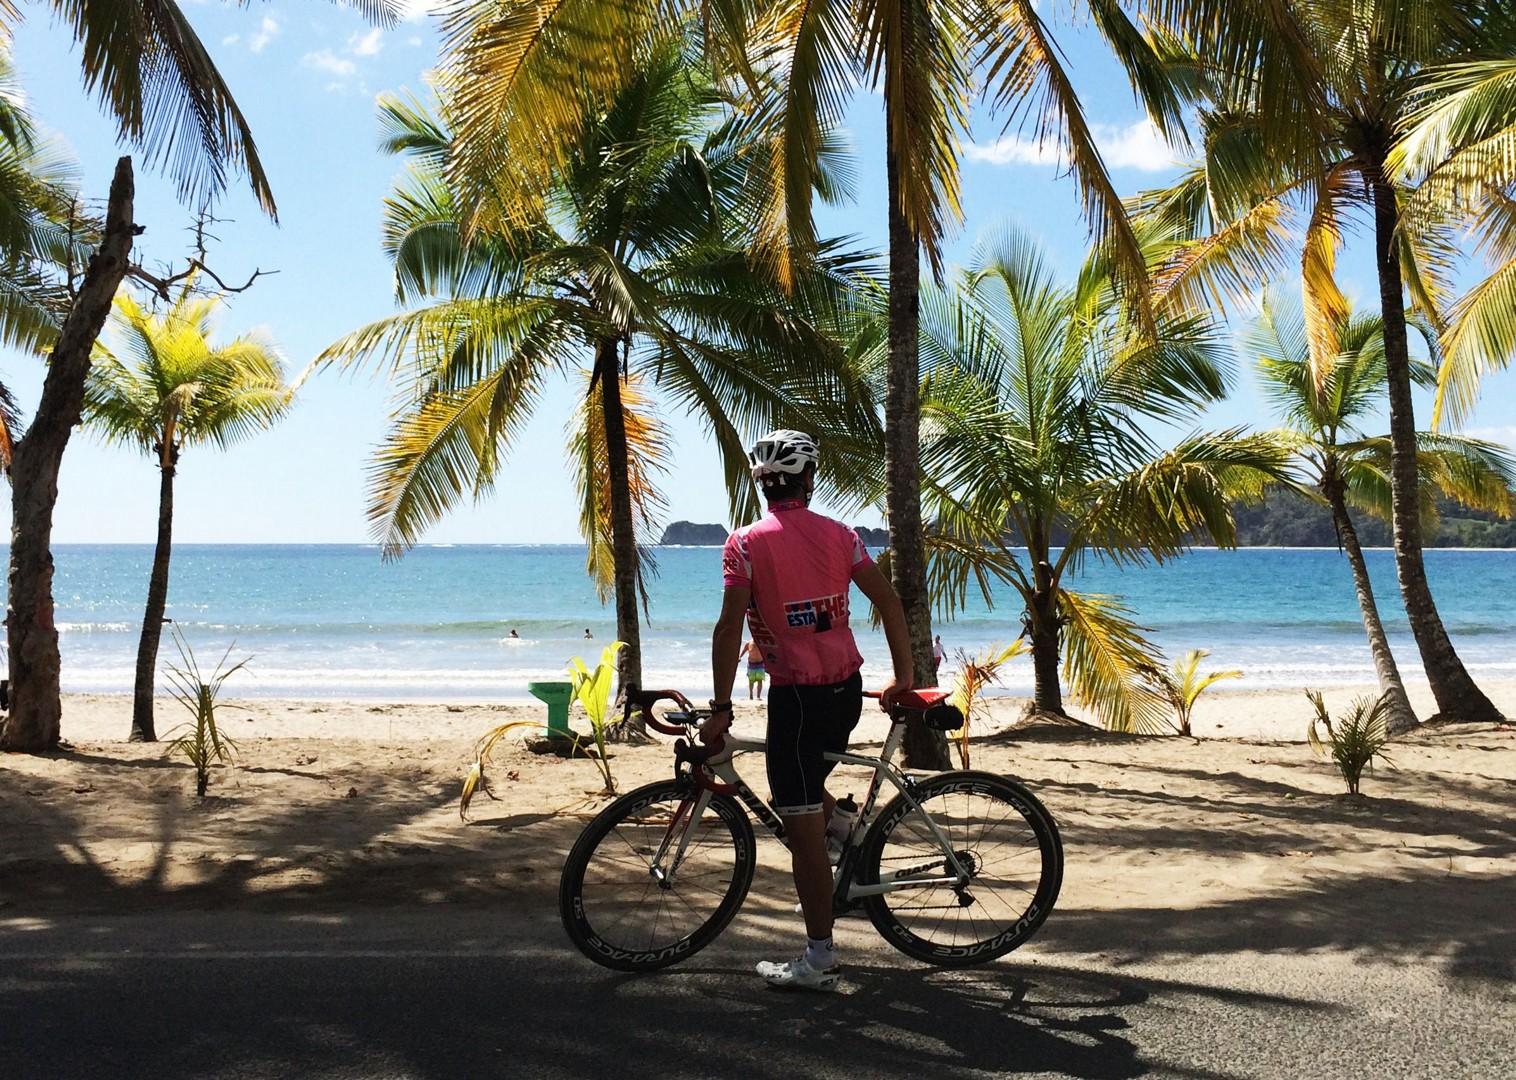 ruta-de-los-volcanes-costa-rica-guided-road-cycling-holiday.JPG - Costa Rica - Ruta de los Volcanes - Road Cycling